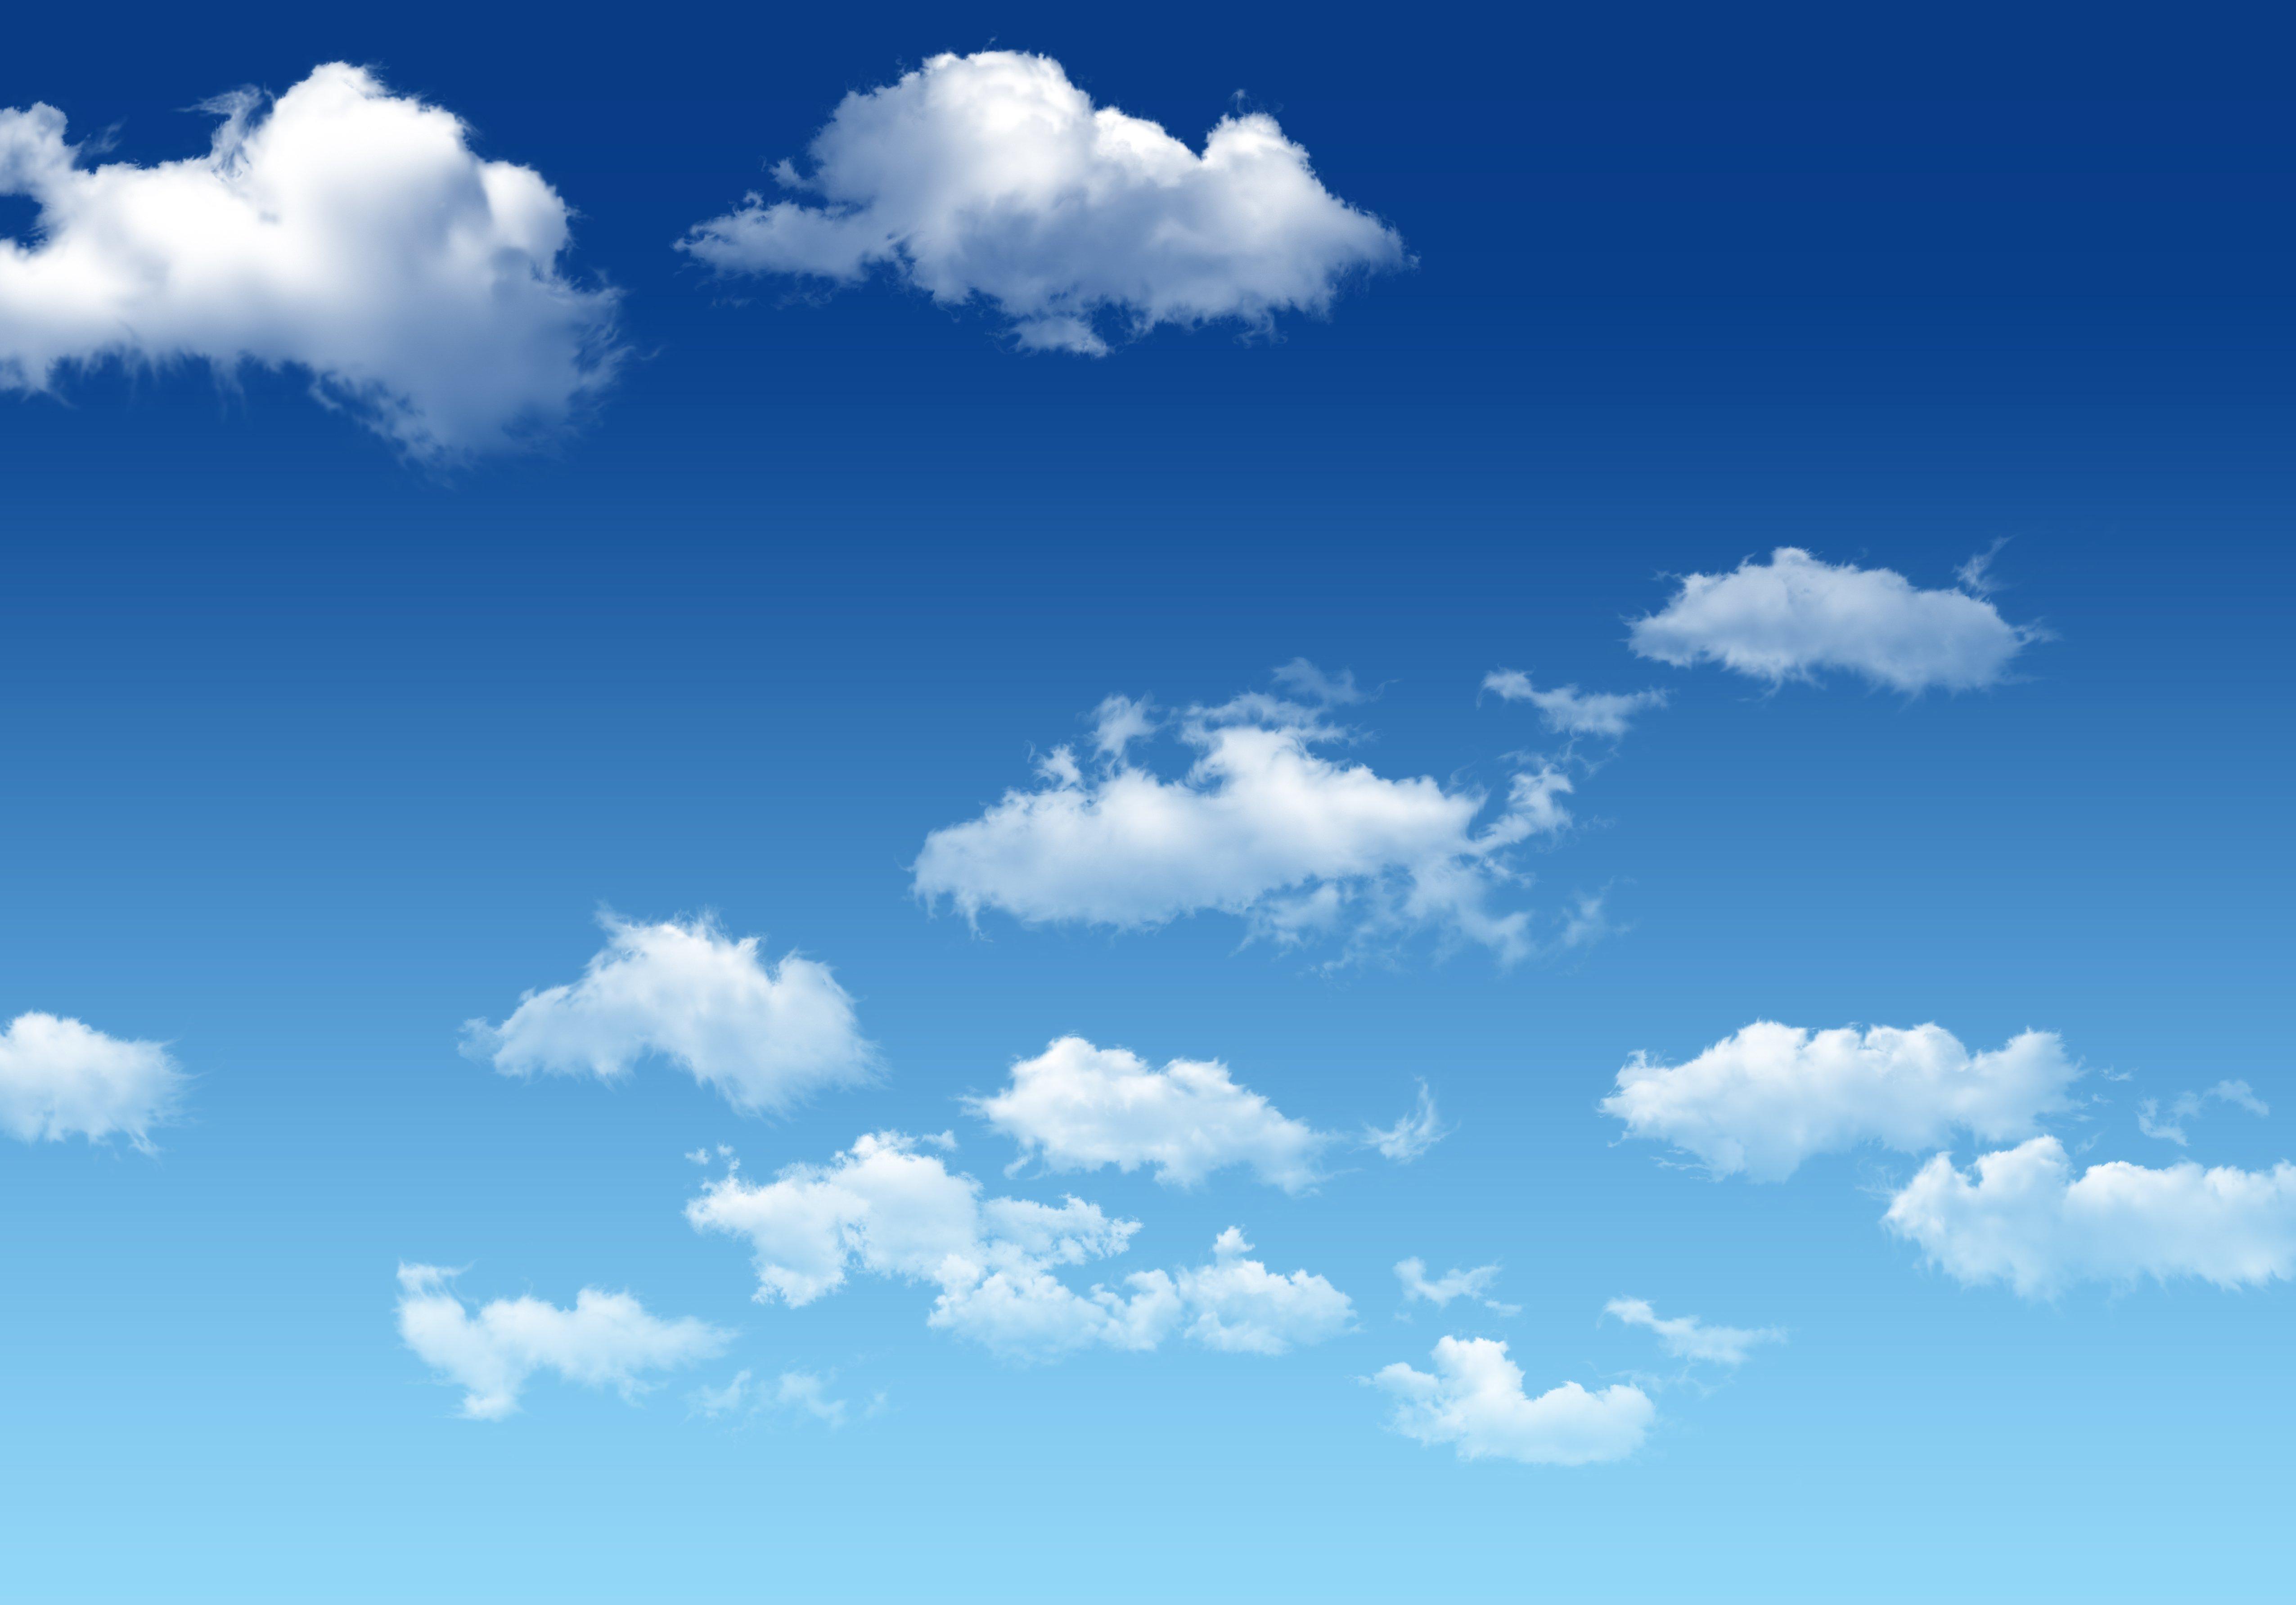 Fondos de pantalla Cielo con nubes